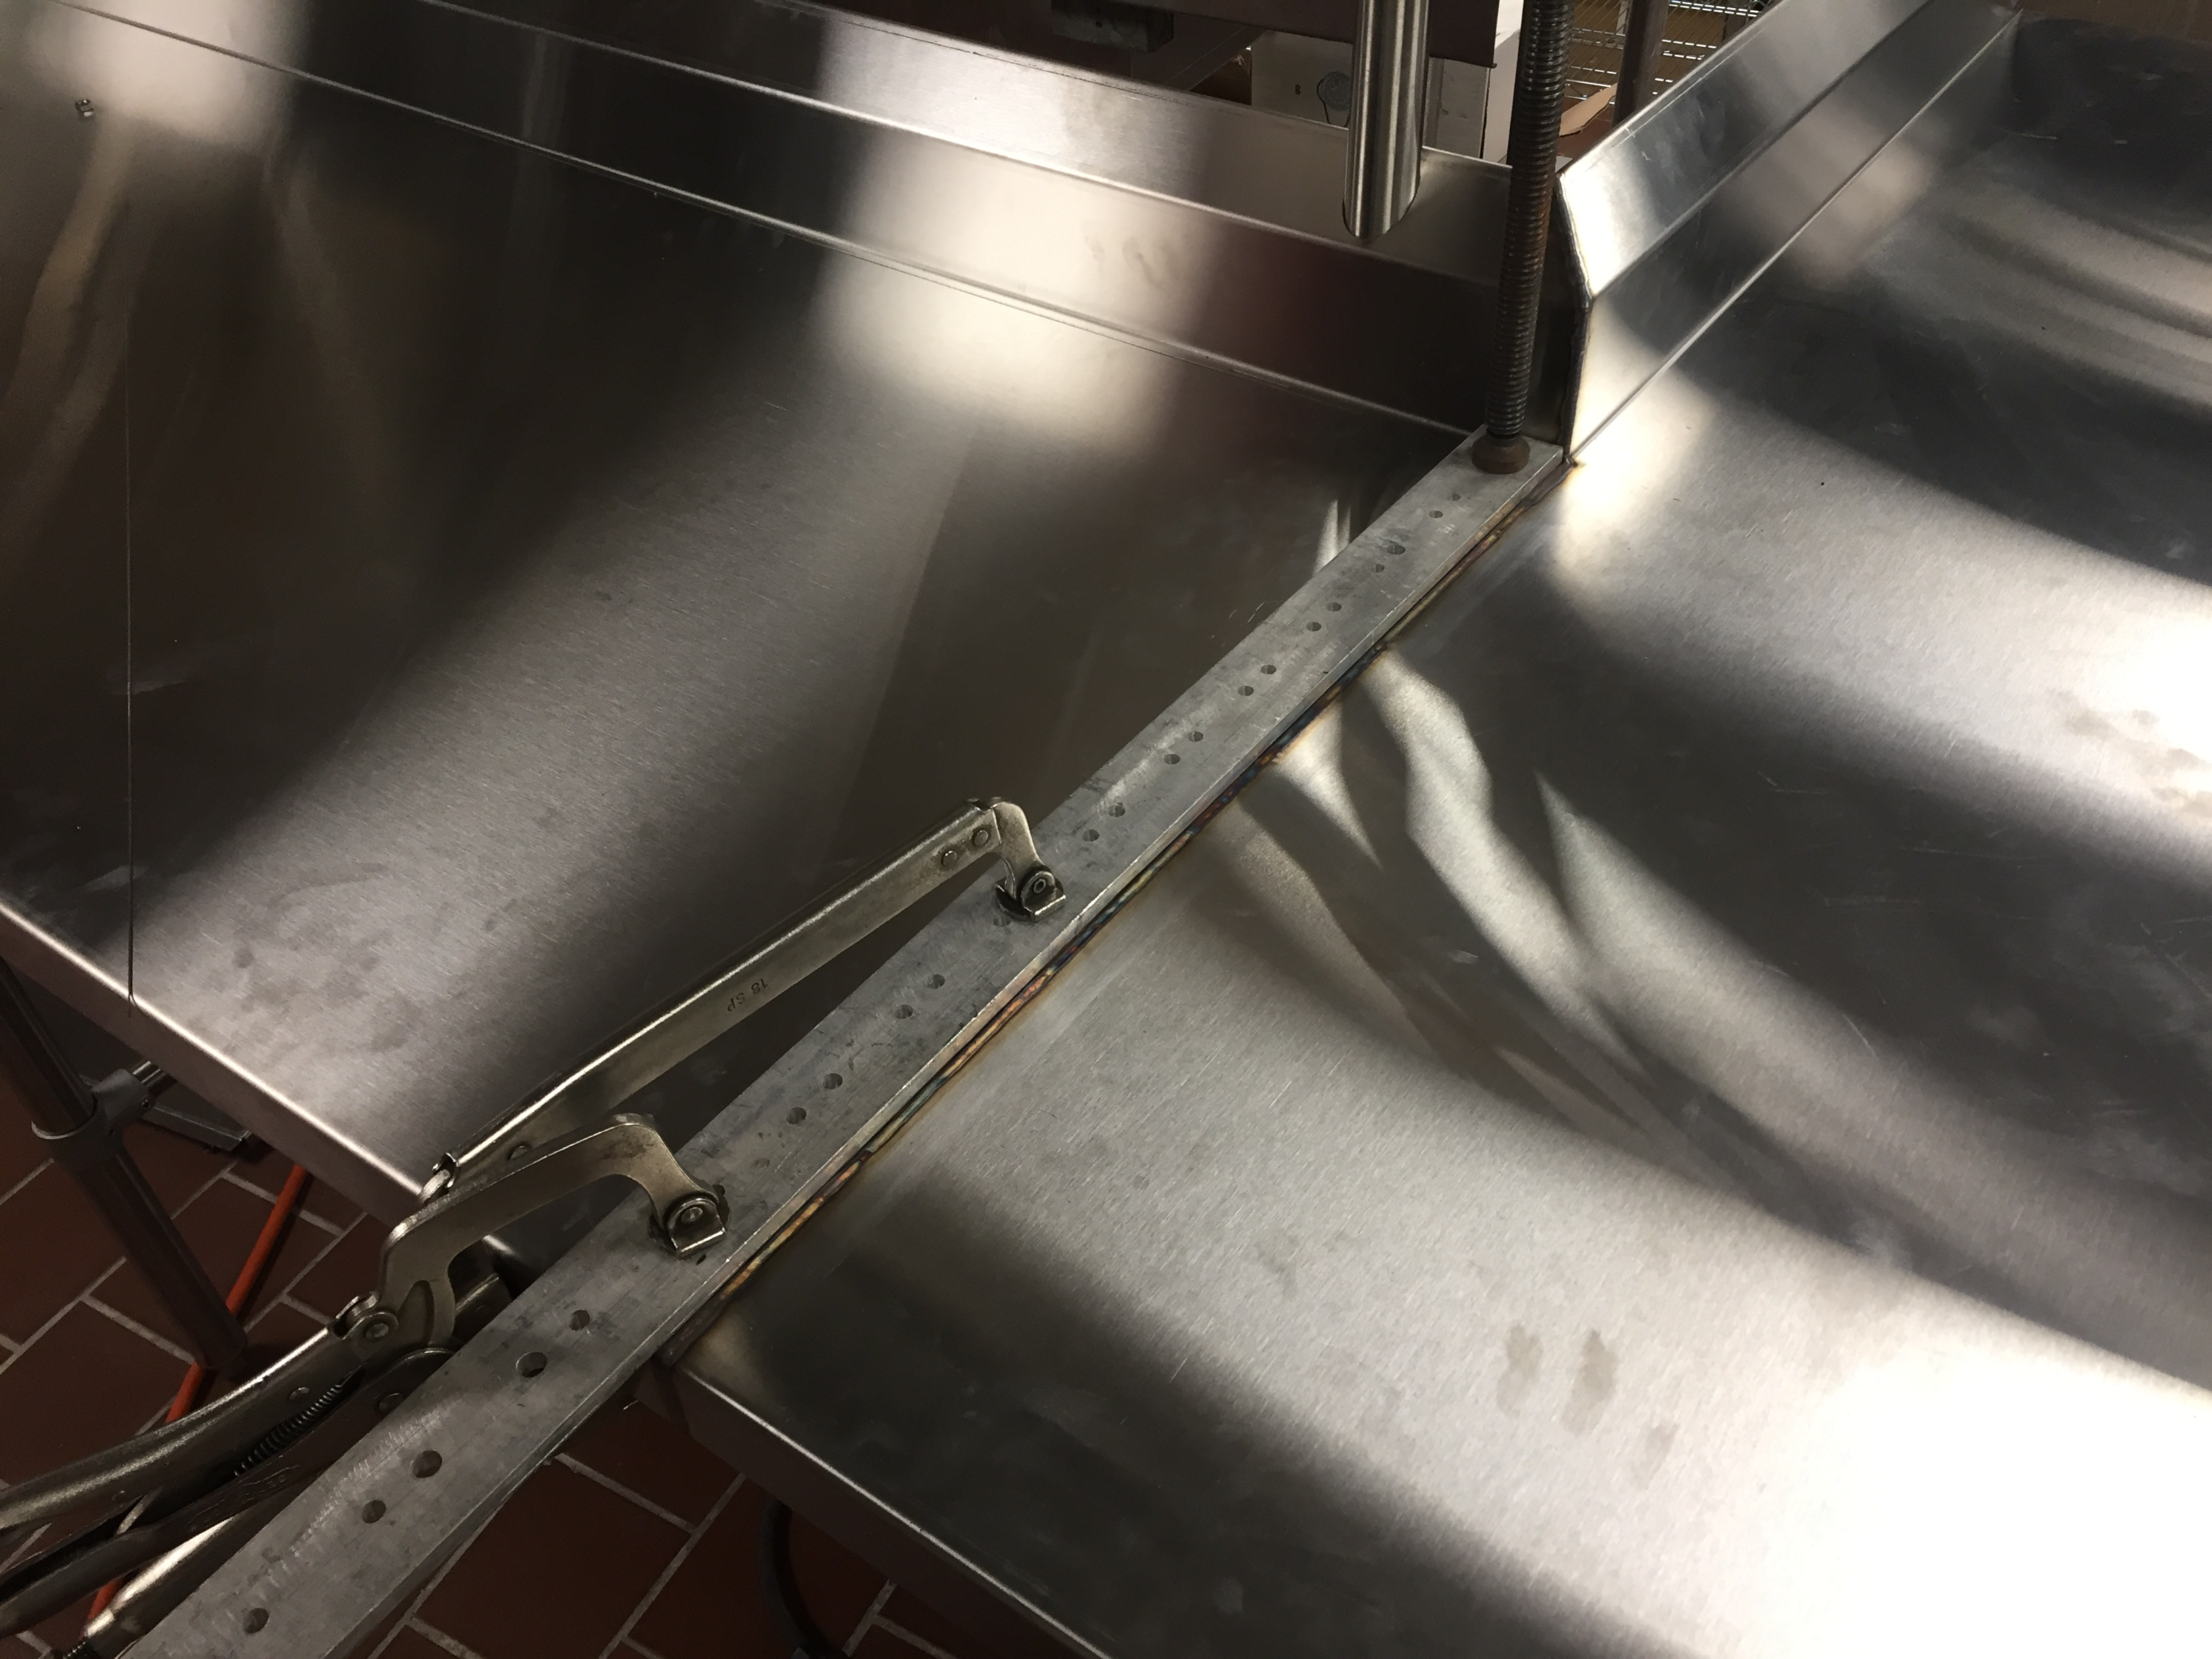 JCK Welding LLC Services Kitchen Equipment Installation Repair Welding-Delivery All LLC Cut